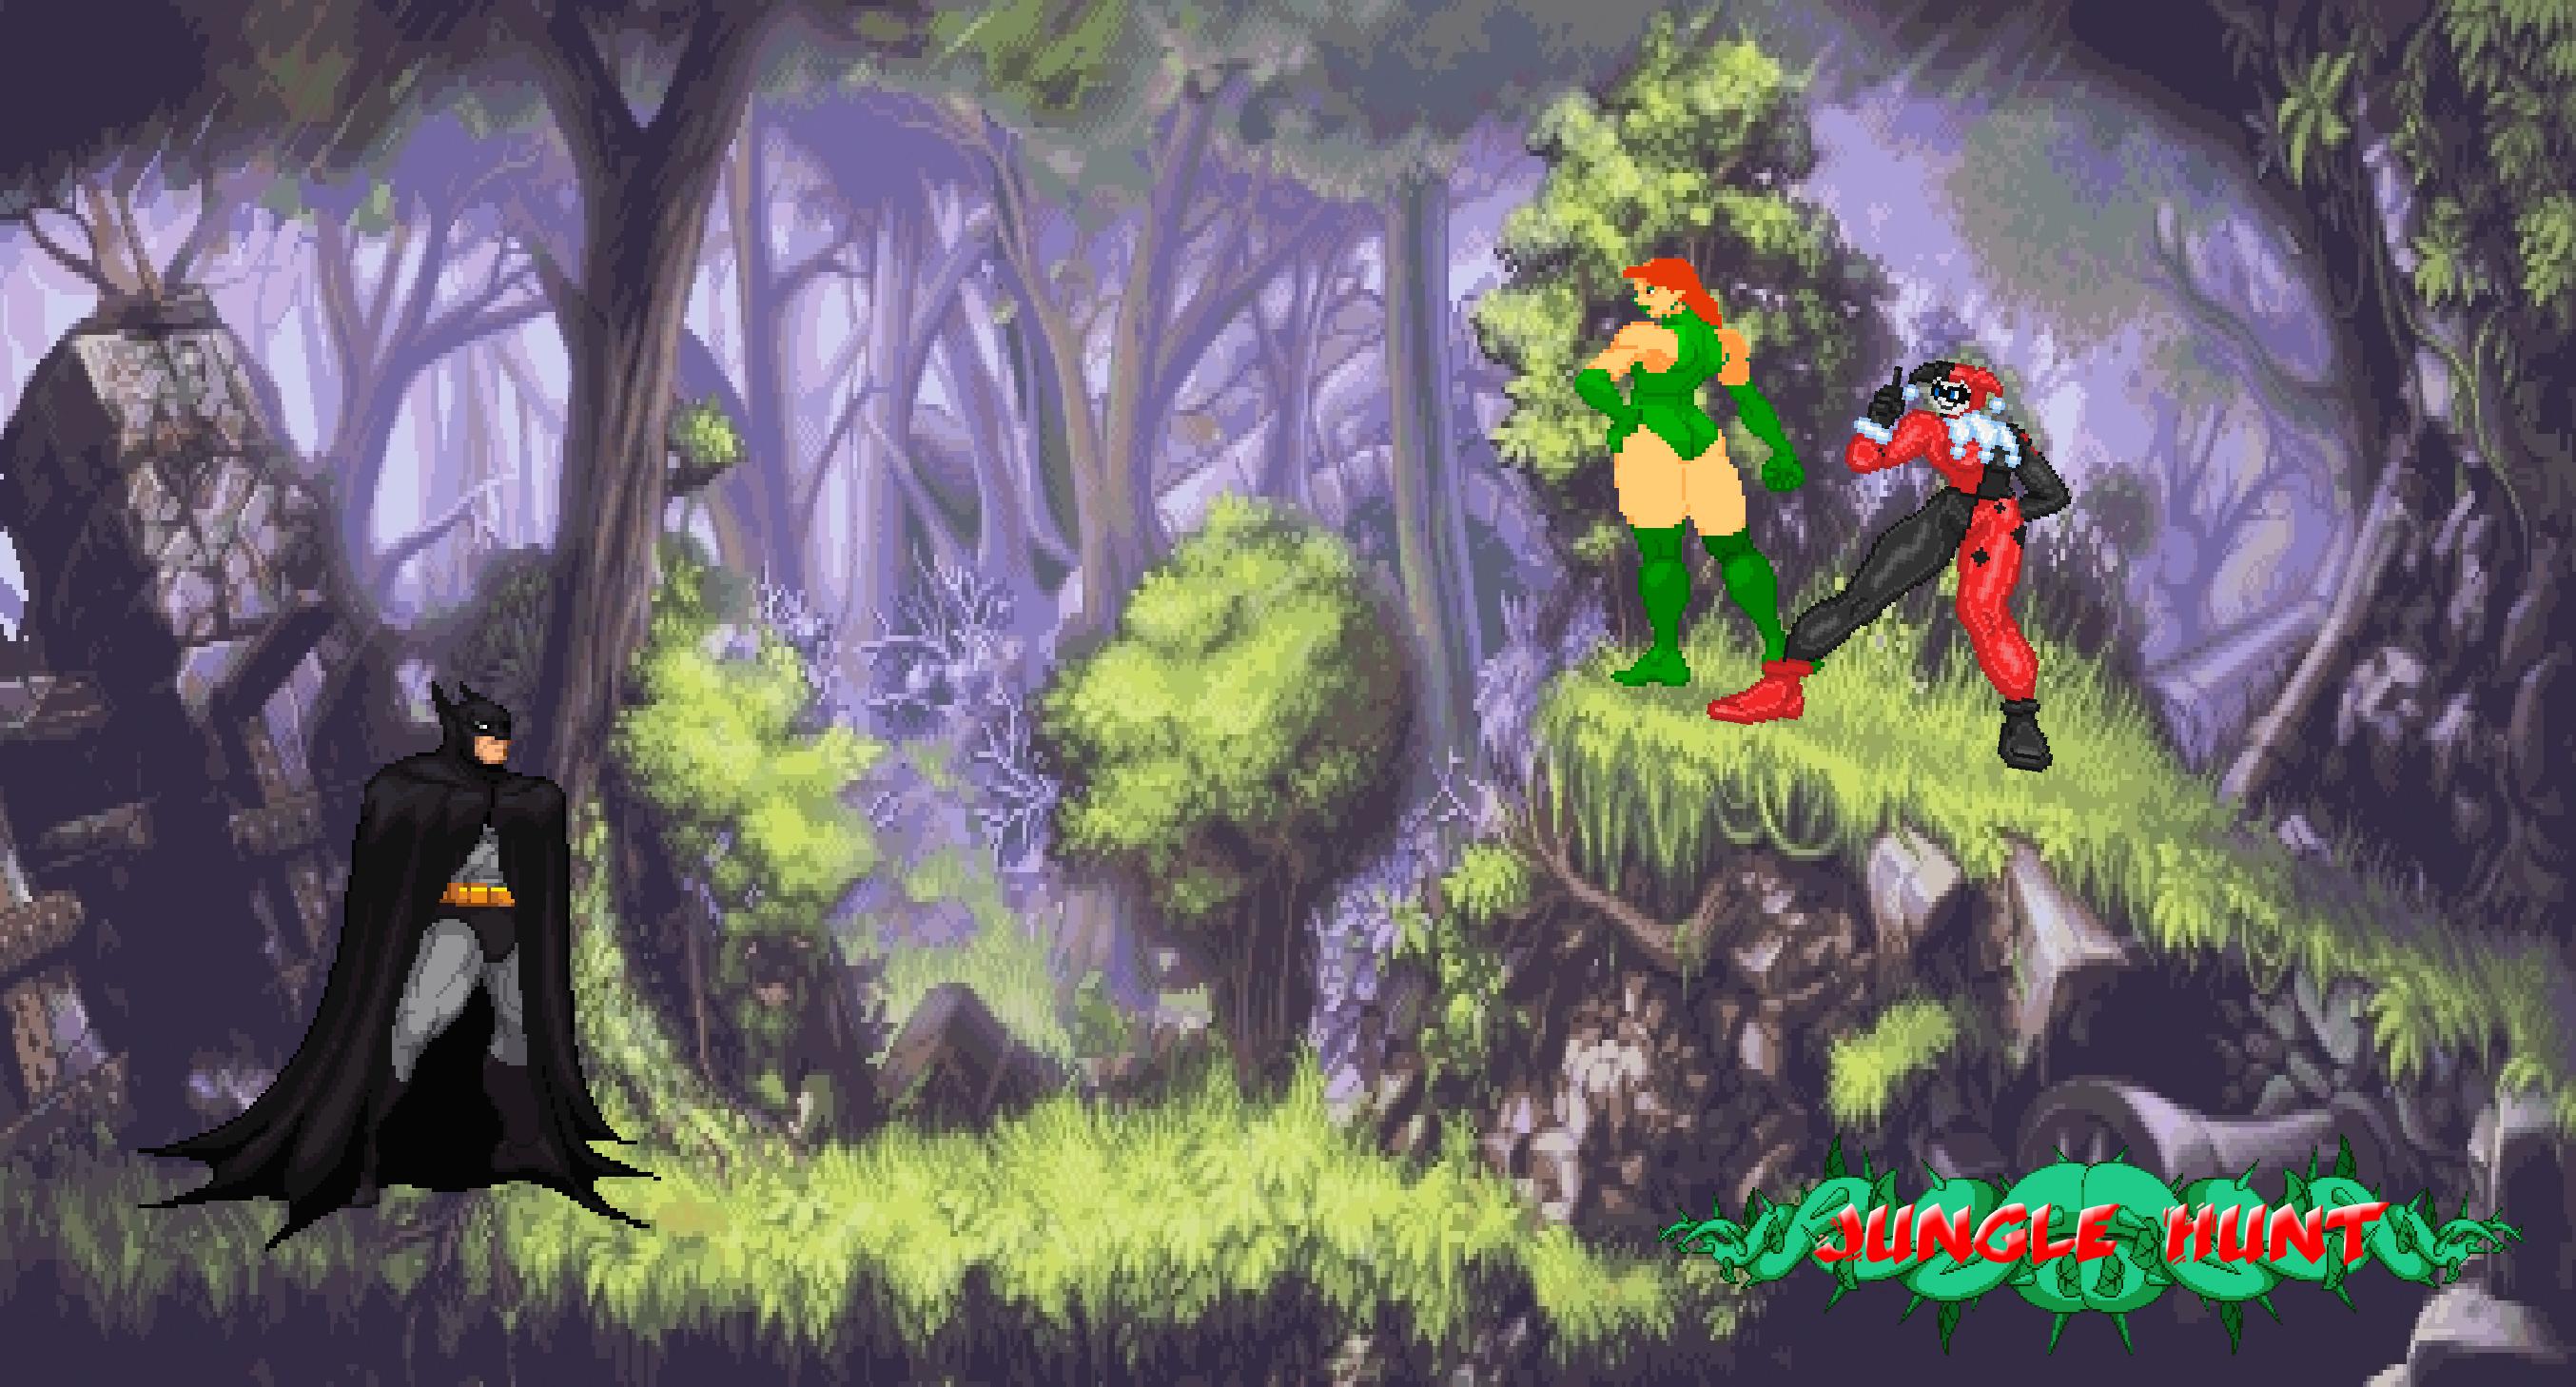 1968023_141195466683_Junglehunt.png